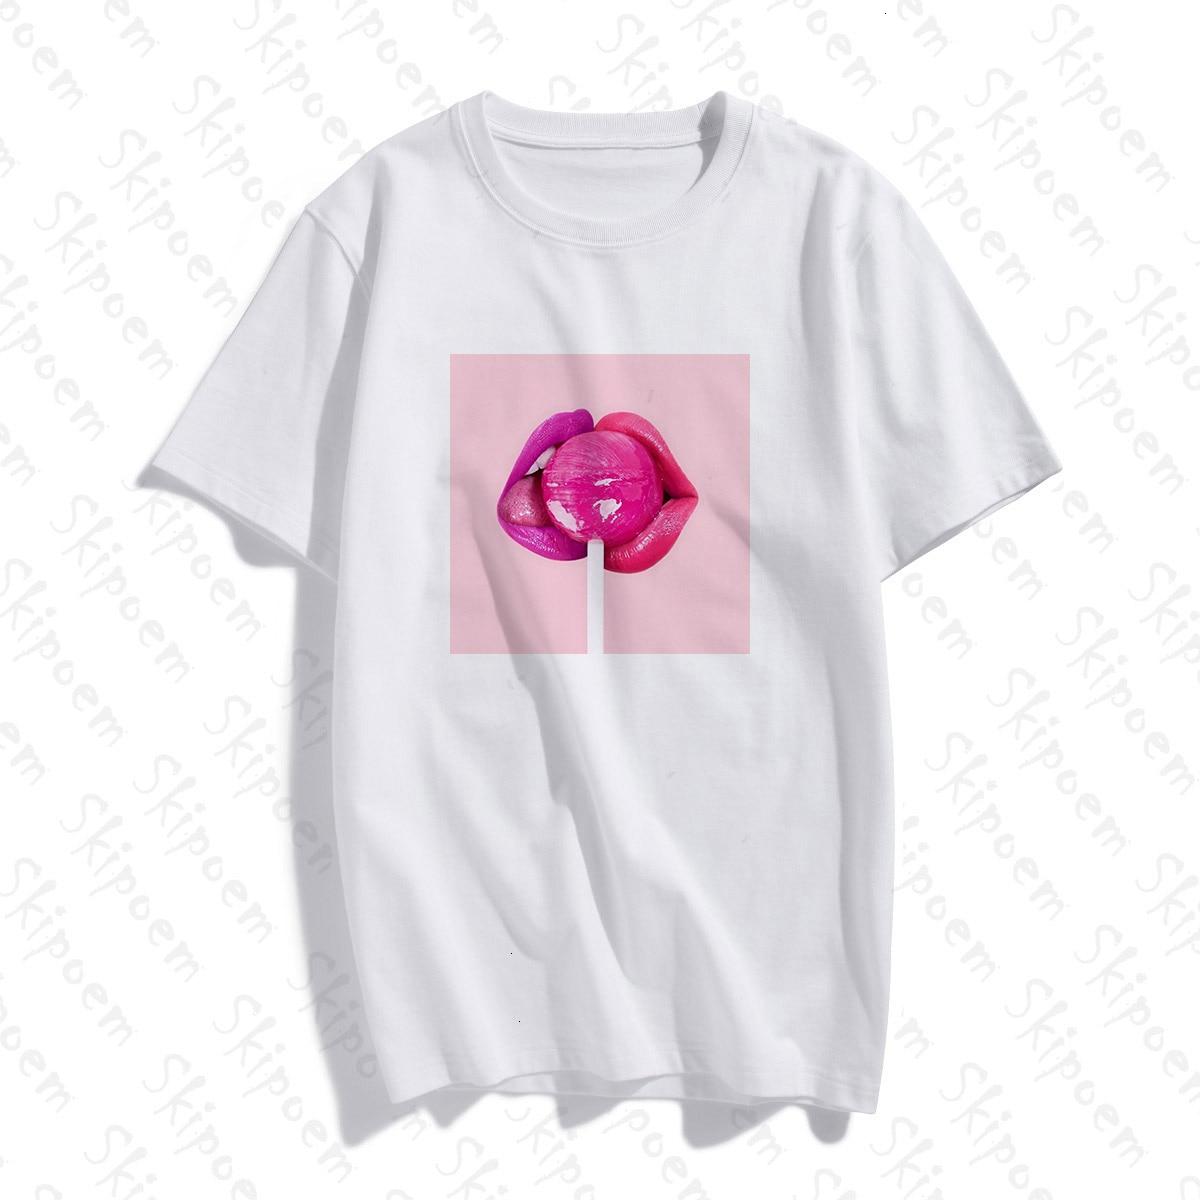 Camiseta Sexy de piruleta con labios rosados estilo coreano Tumblr Punk Harajuku de algodón de manga corta de talla grande camiseta de mujer